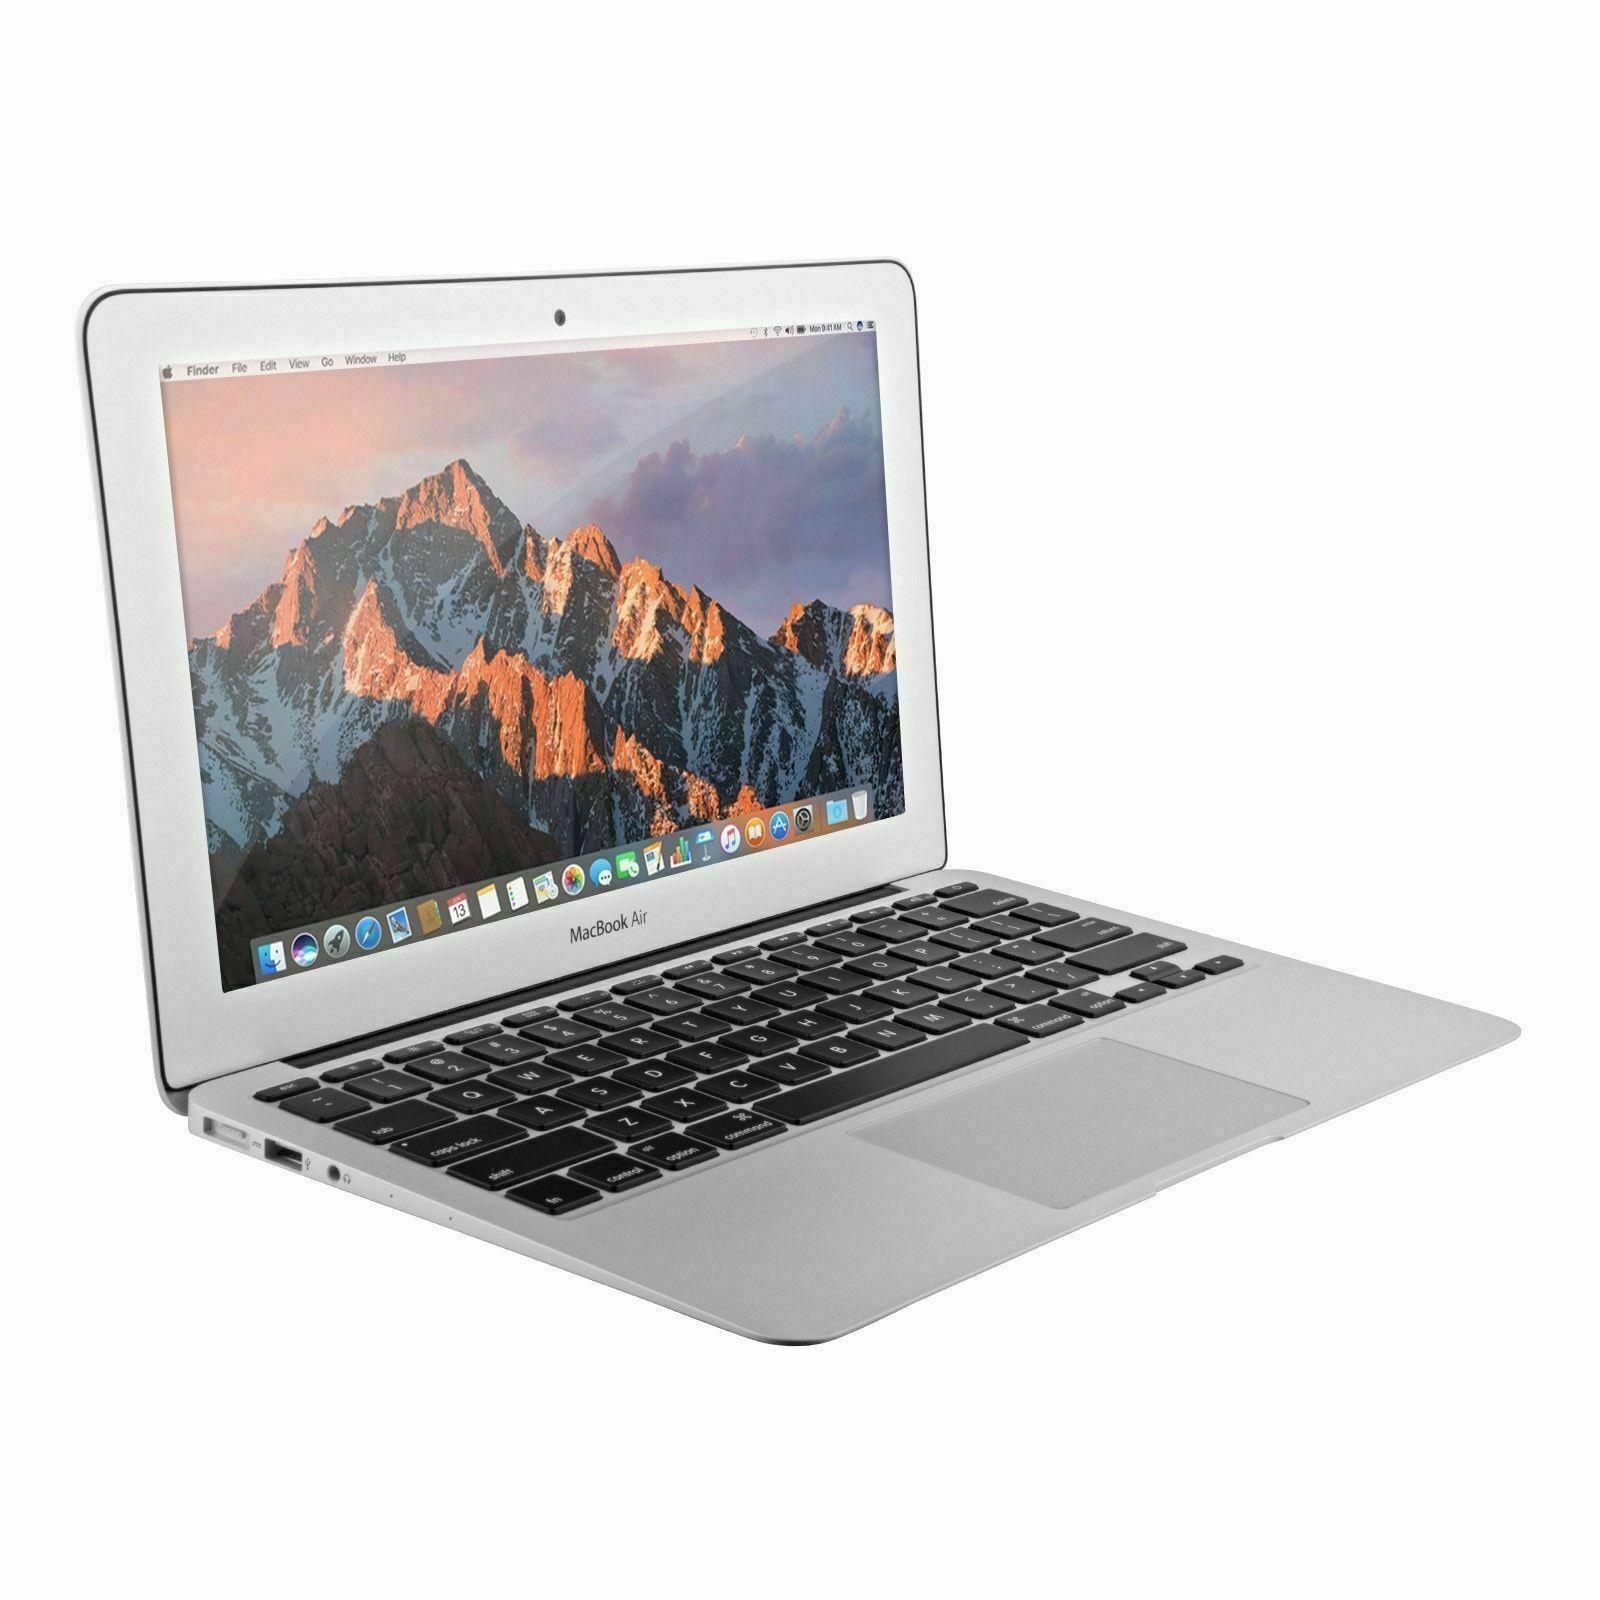 eBay Apple MacBook Air Core i5 1.6GHz 4GB RAM 128GB SSD